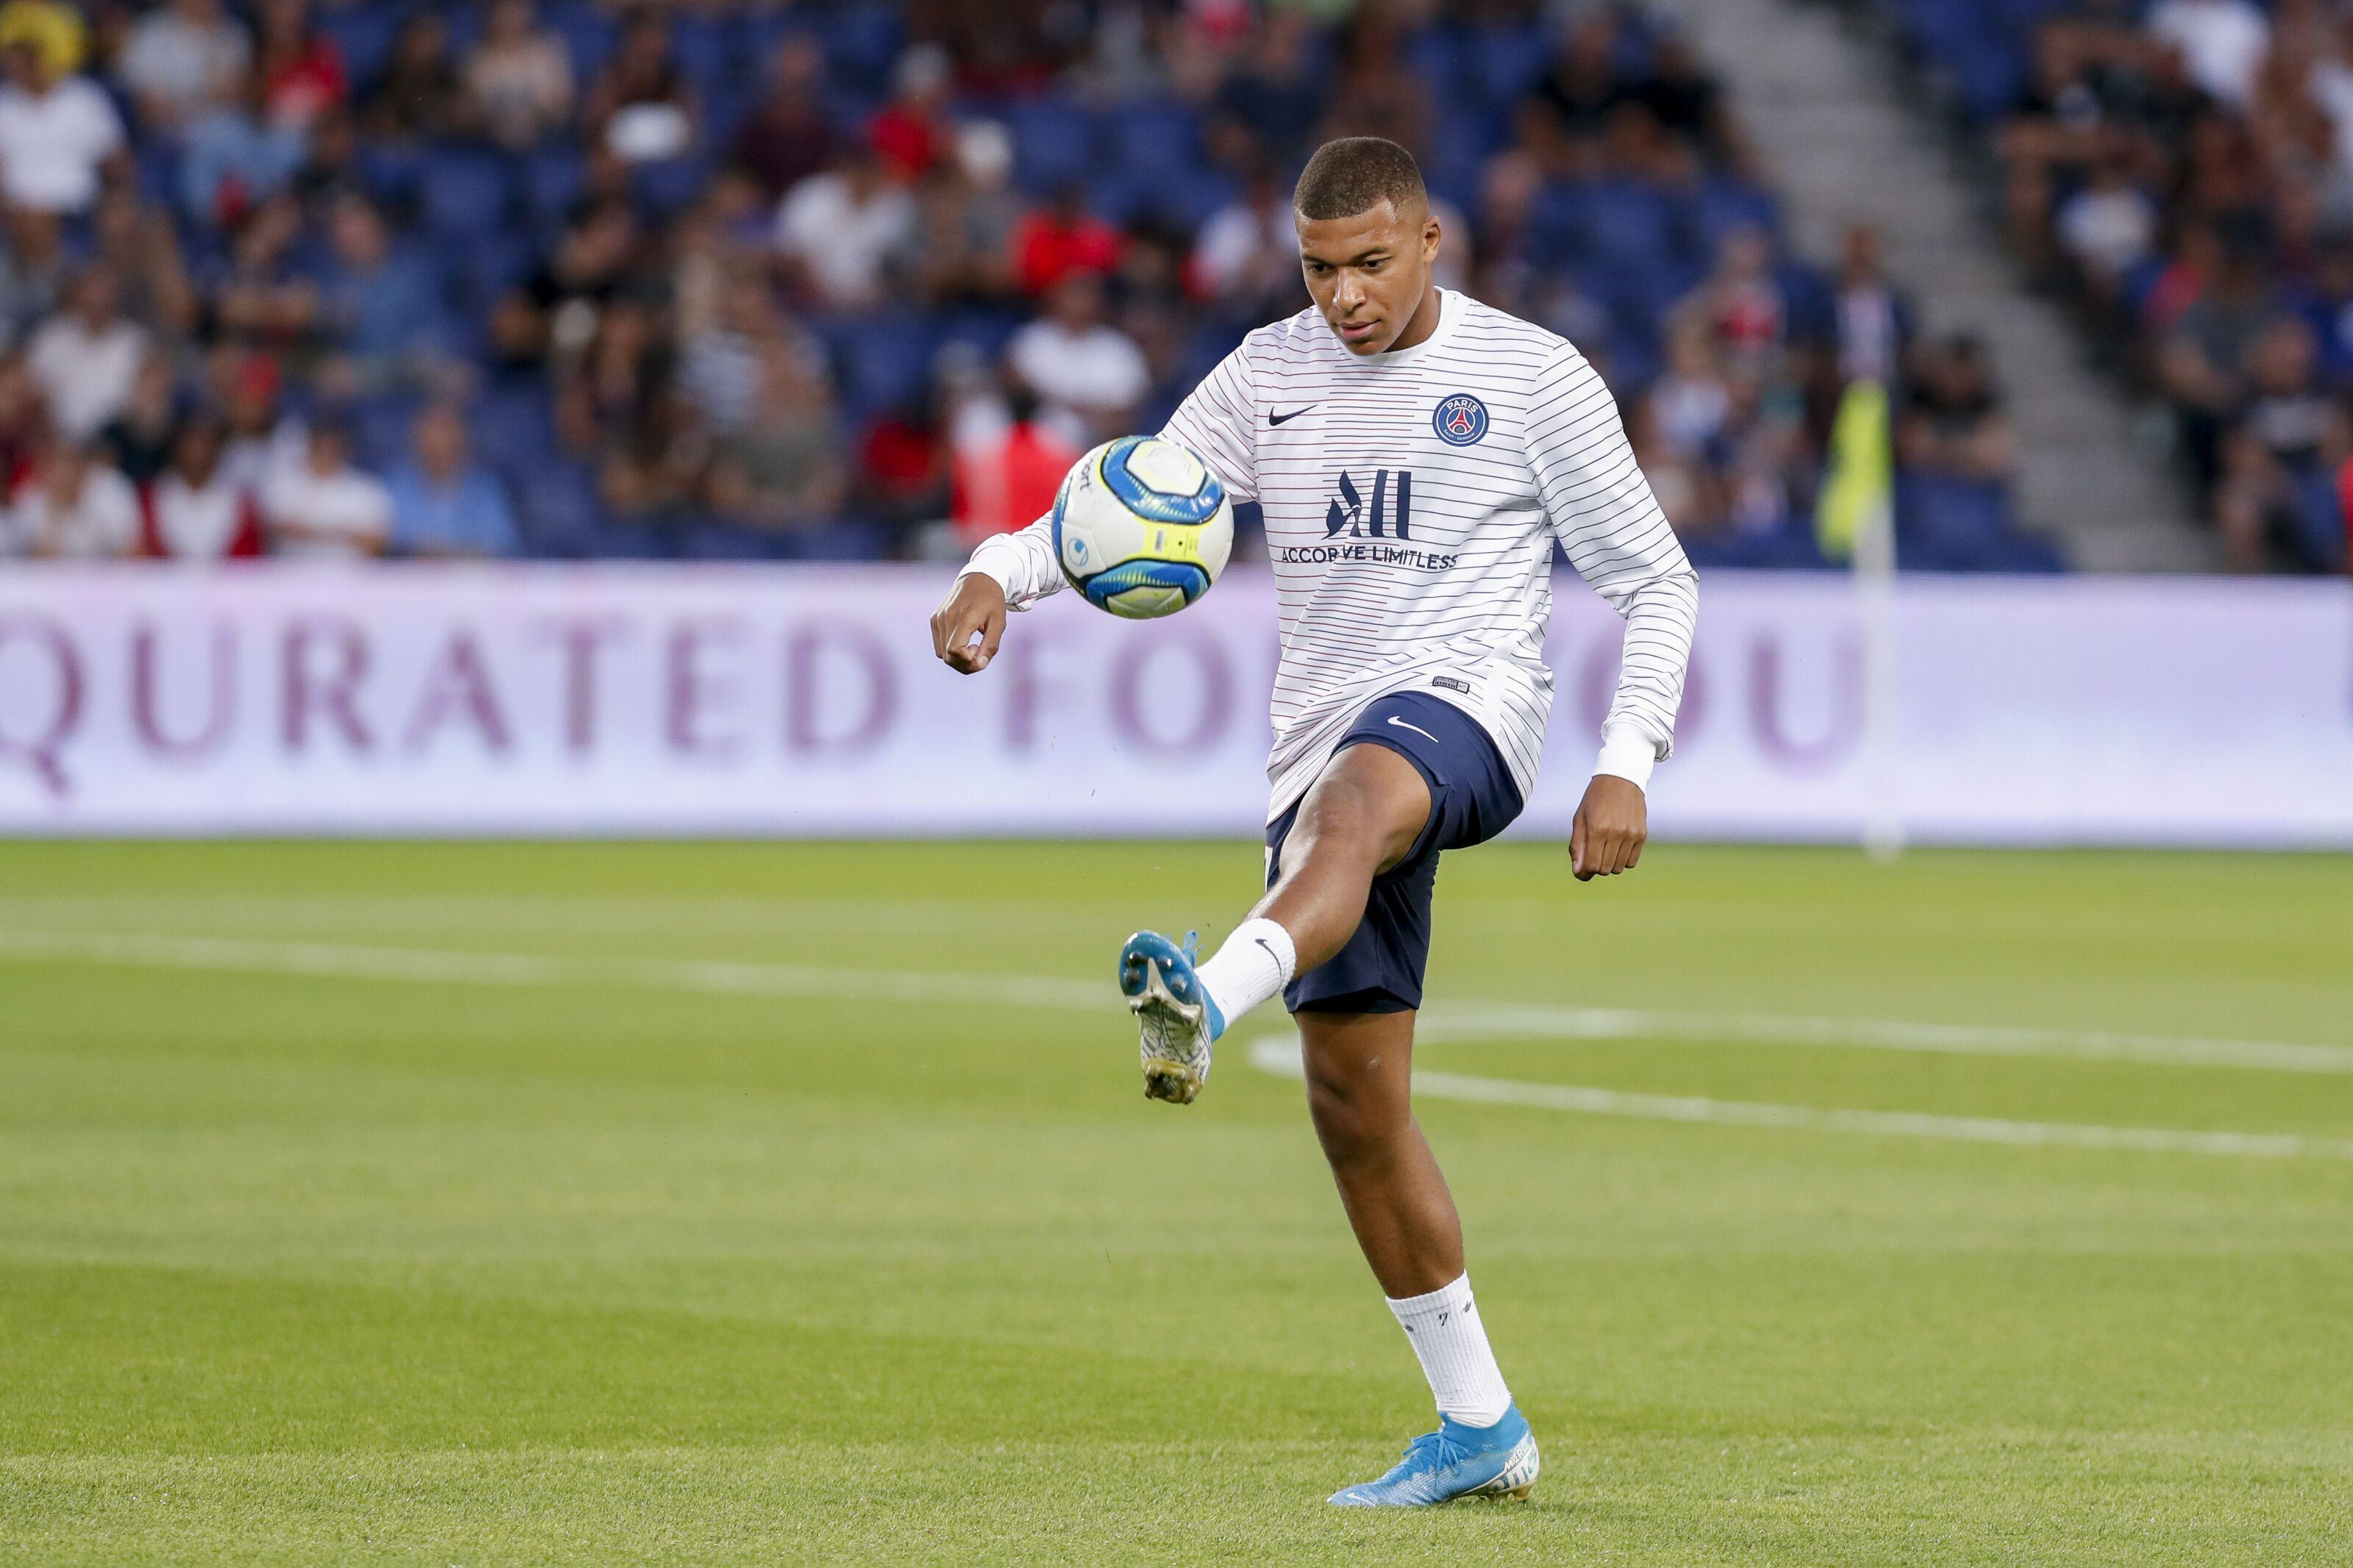 Paris Saint-Germain ask Real Madrid to swap key player for Kylian Mbappe